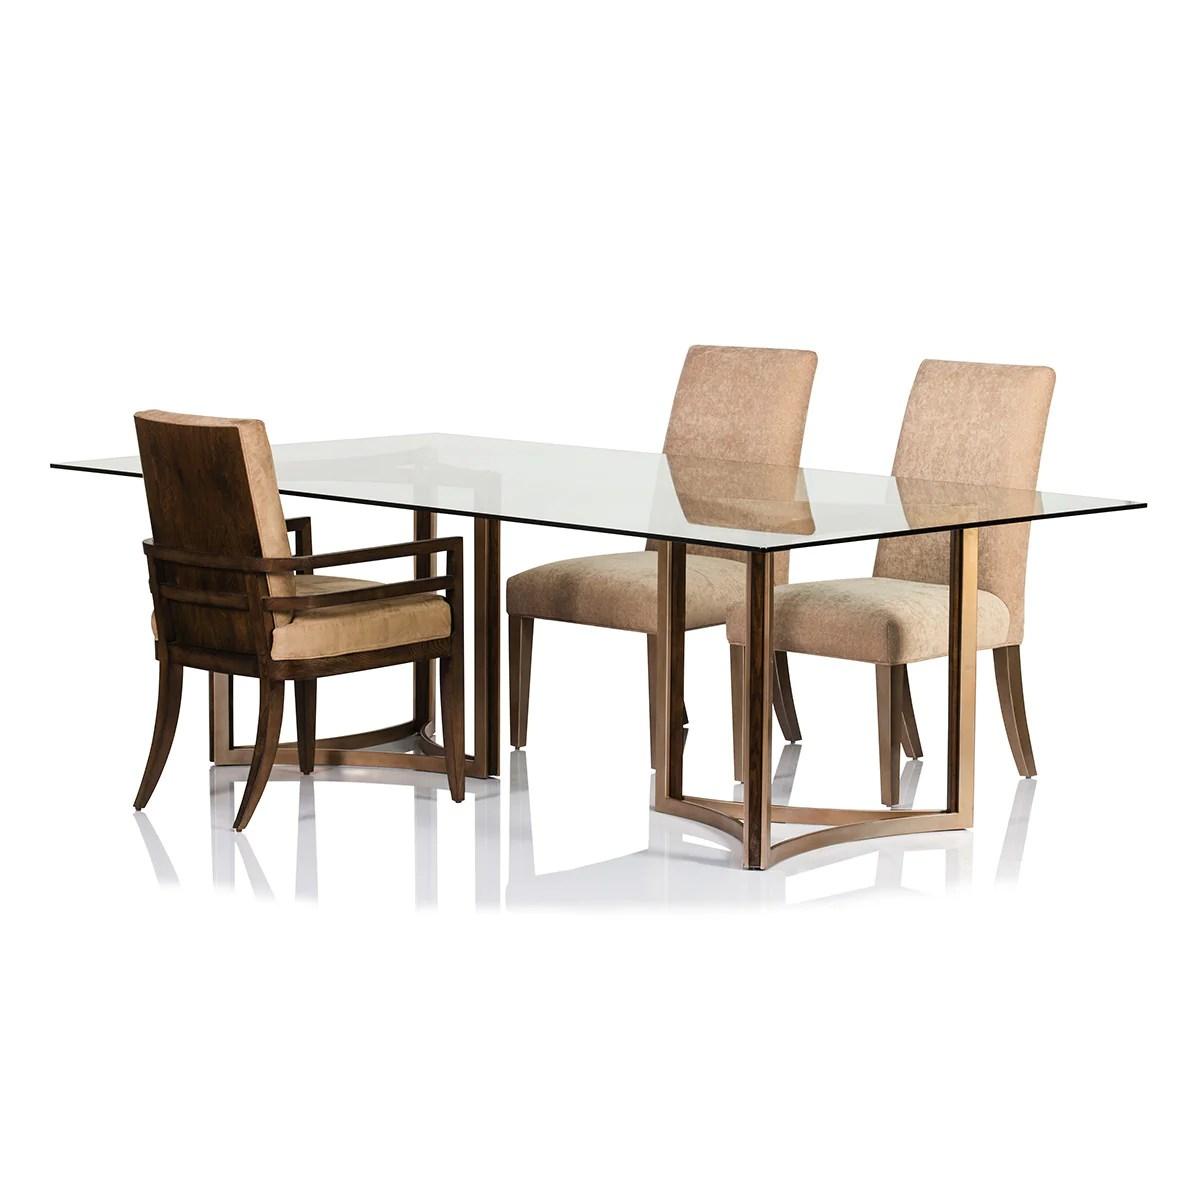 Manhattan Glass Top Table - Max Sparrow